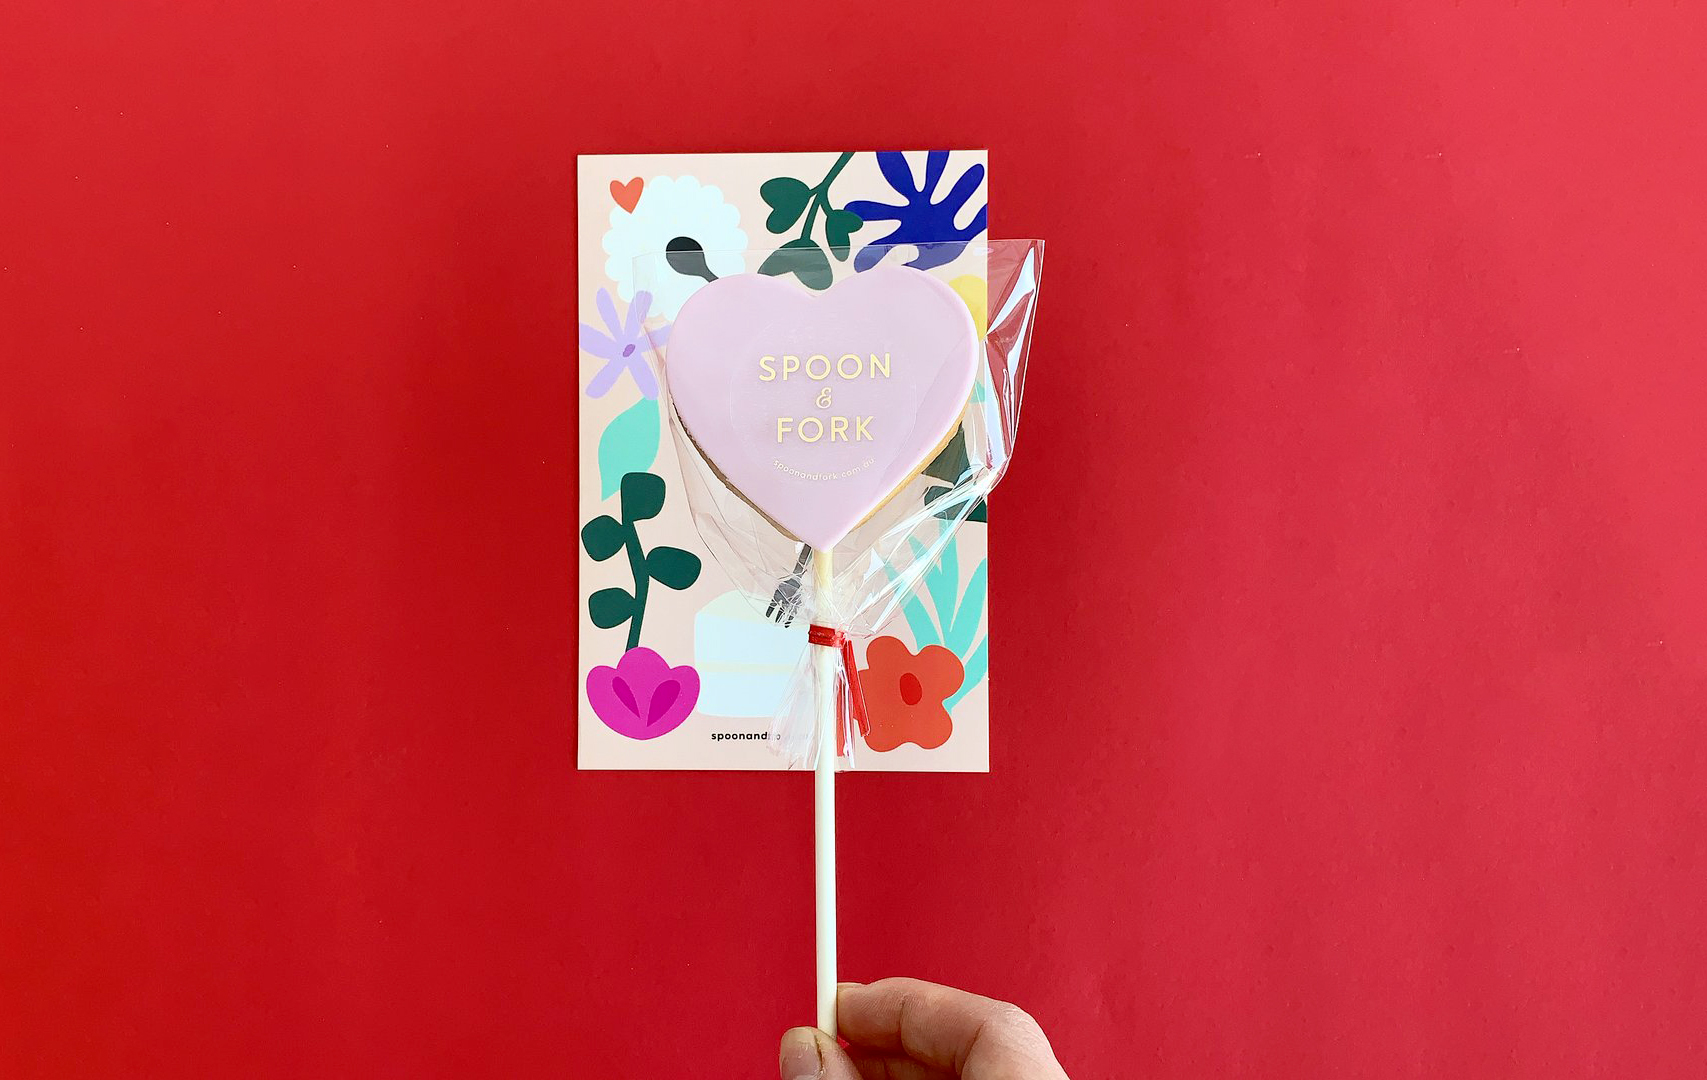 spoon-and-fork-brand-design-illustration-gold-sticker